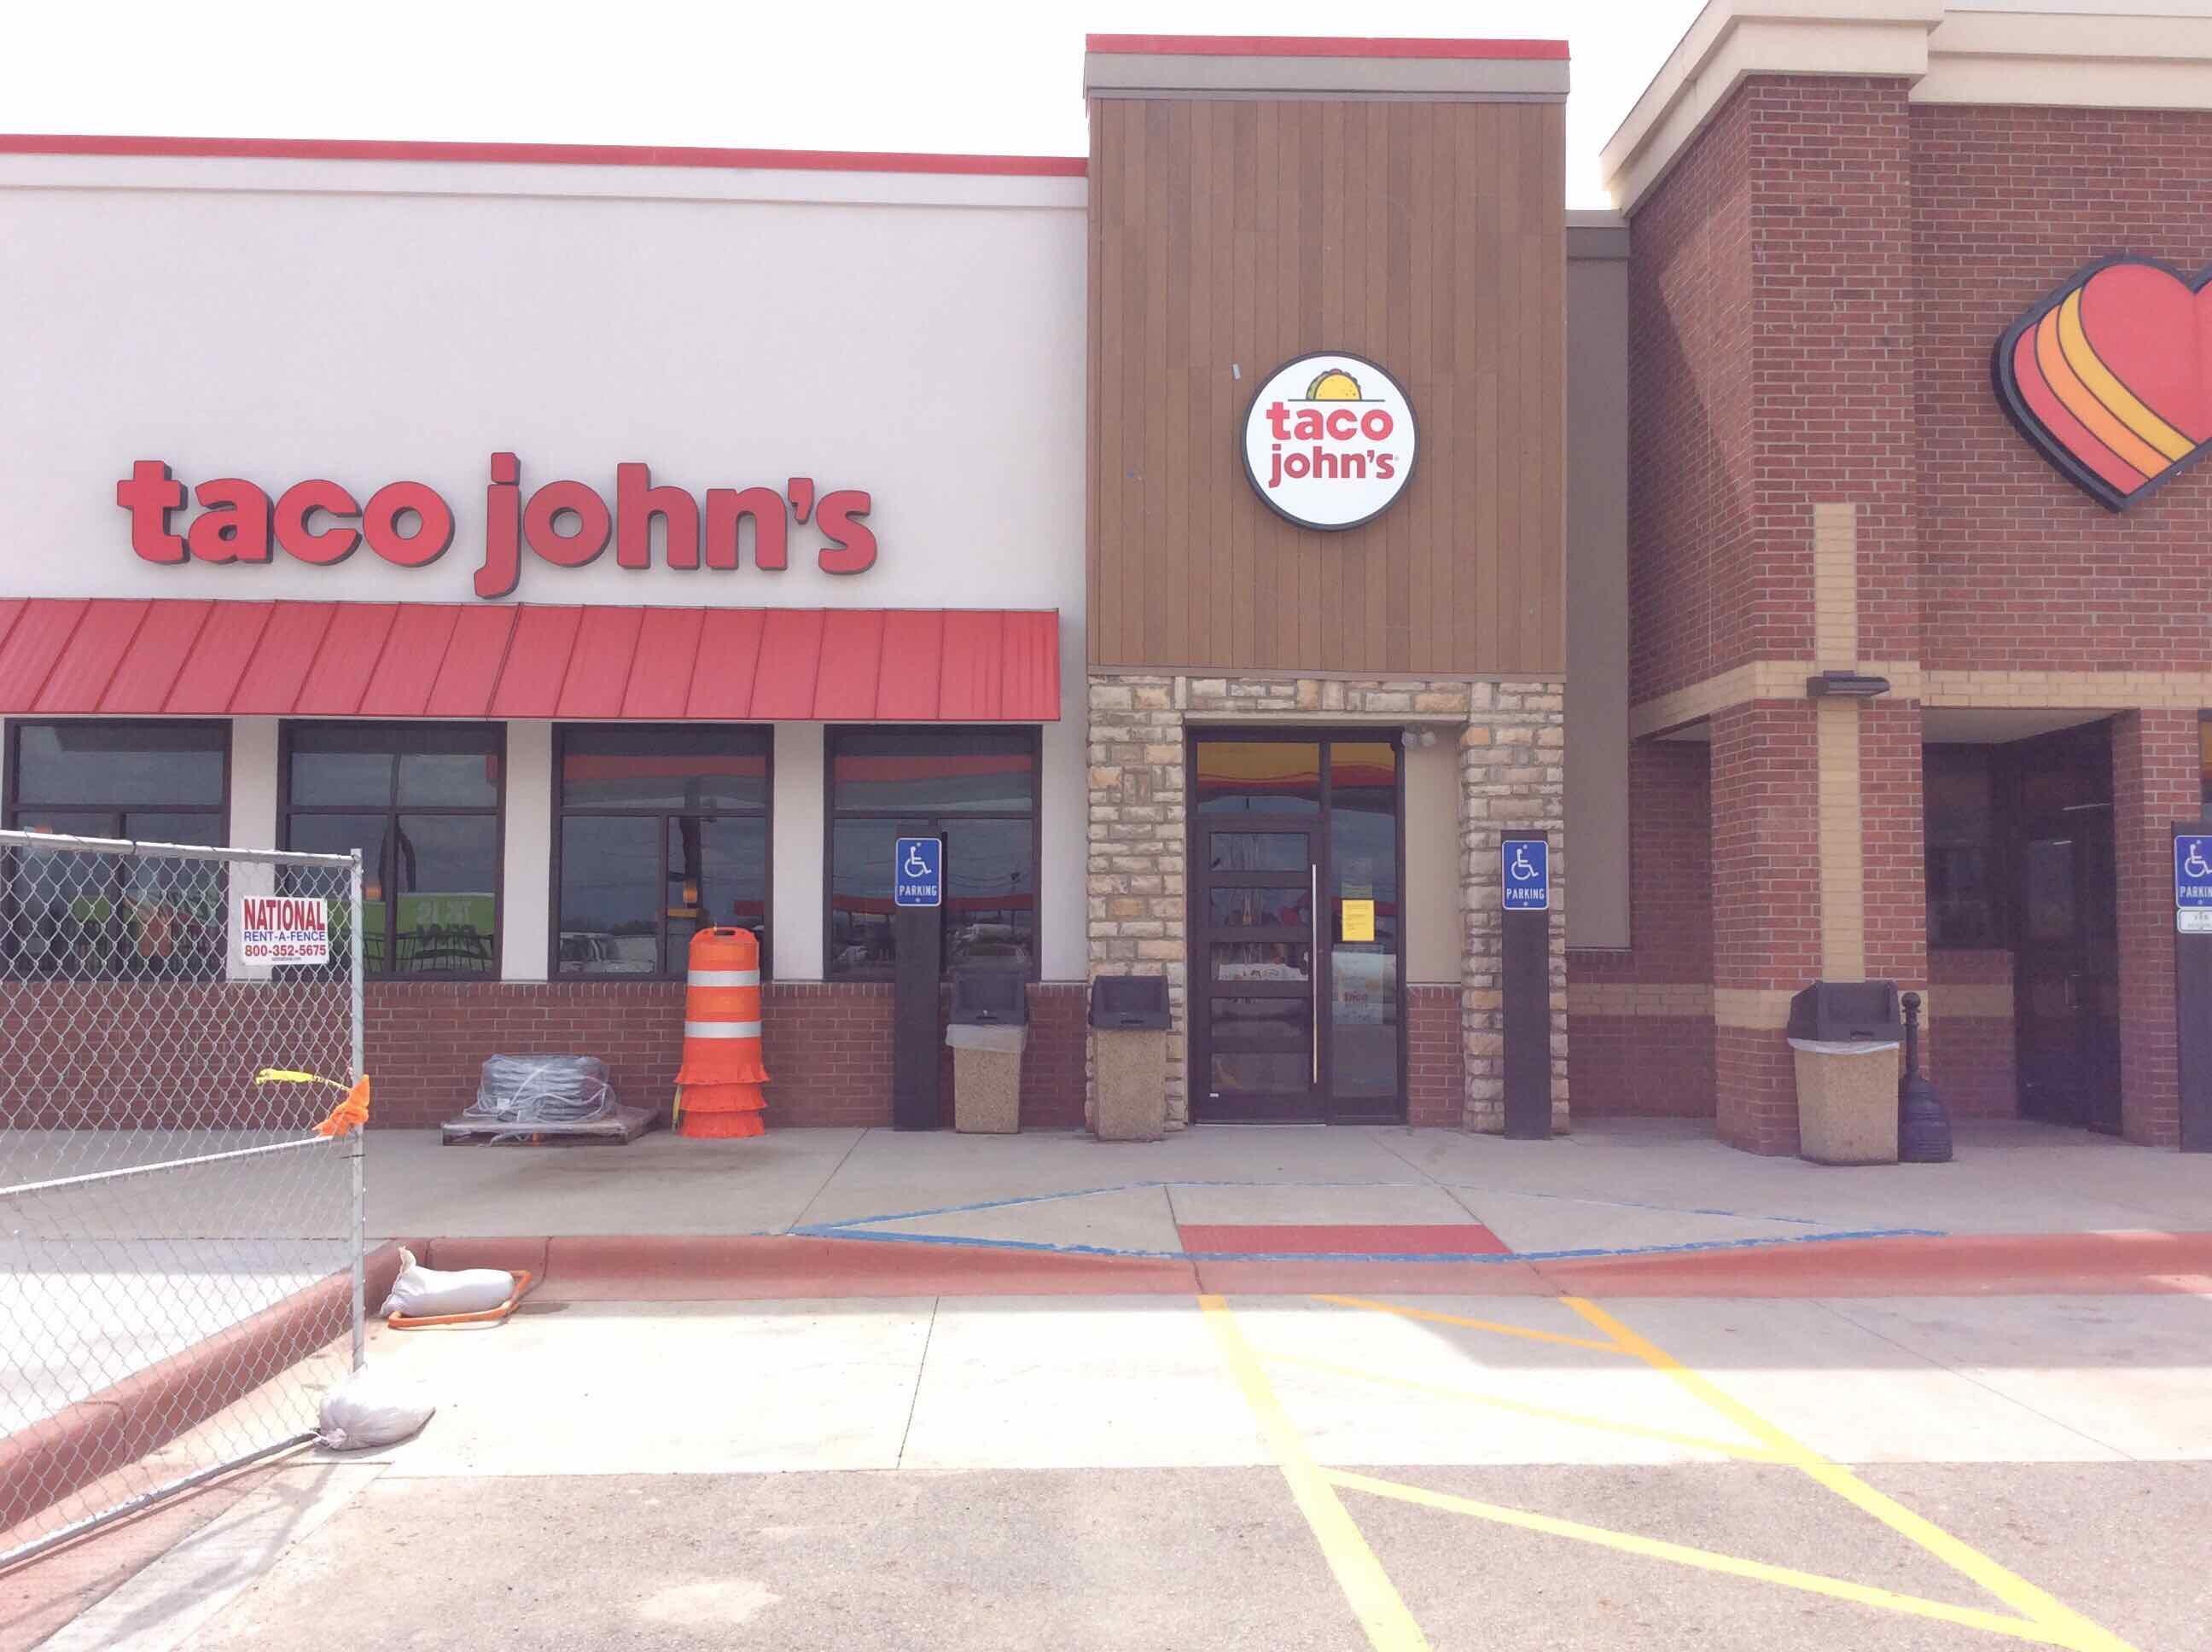 Taco John's exterior shot